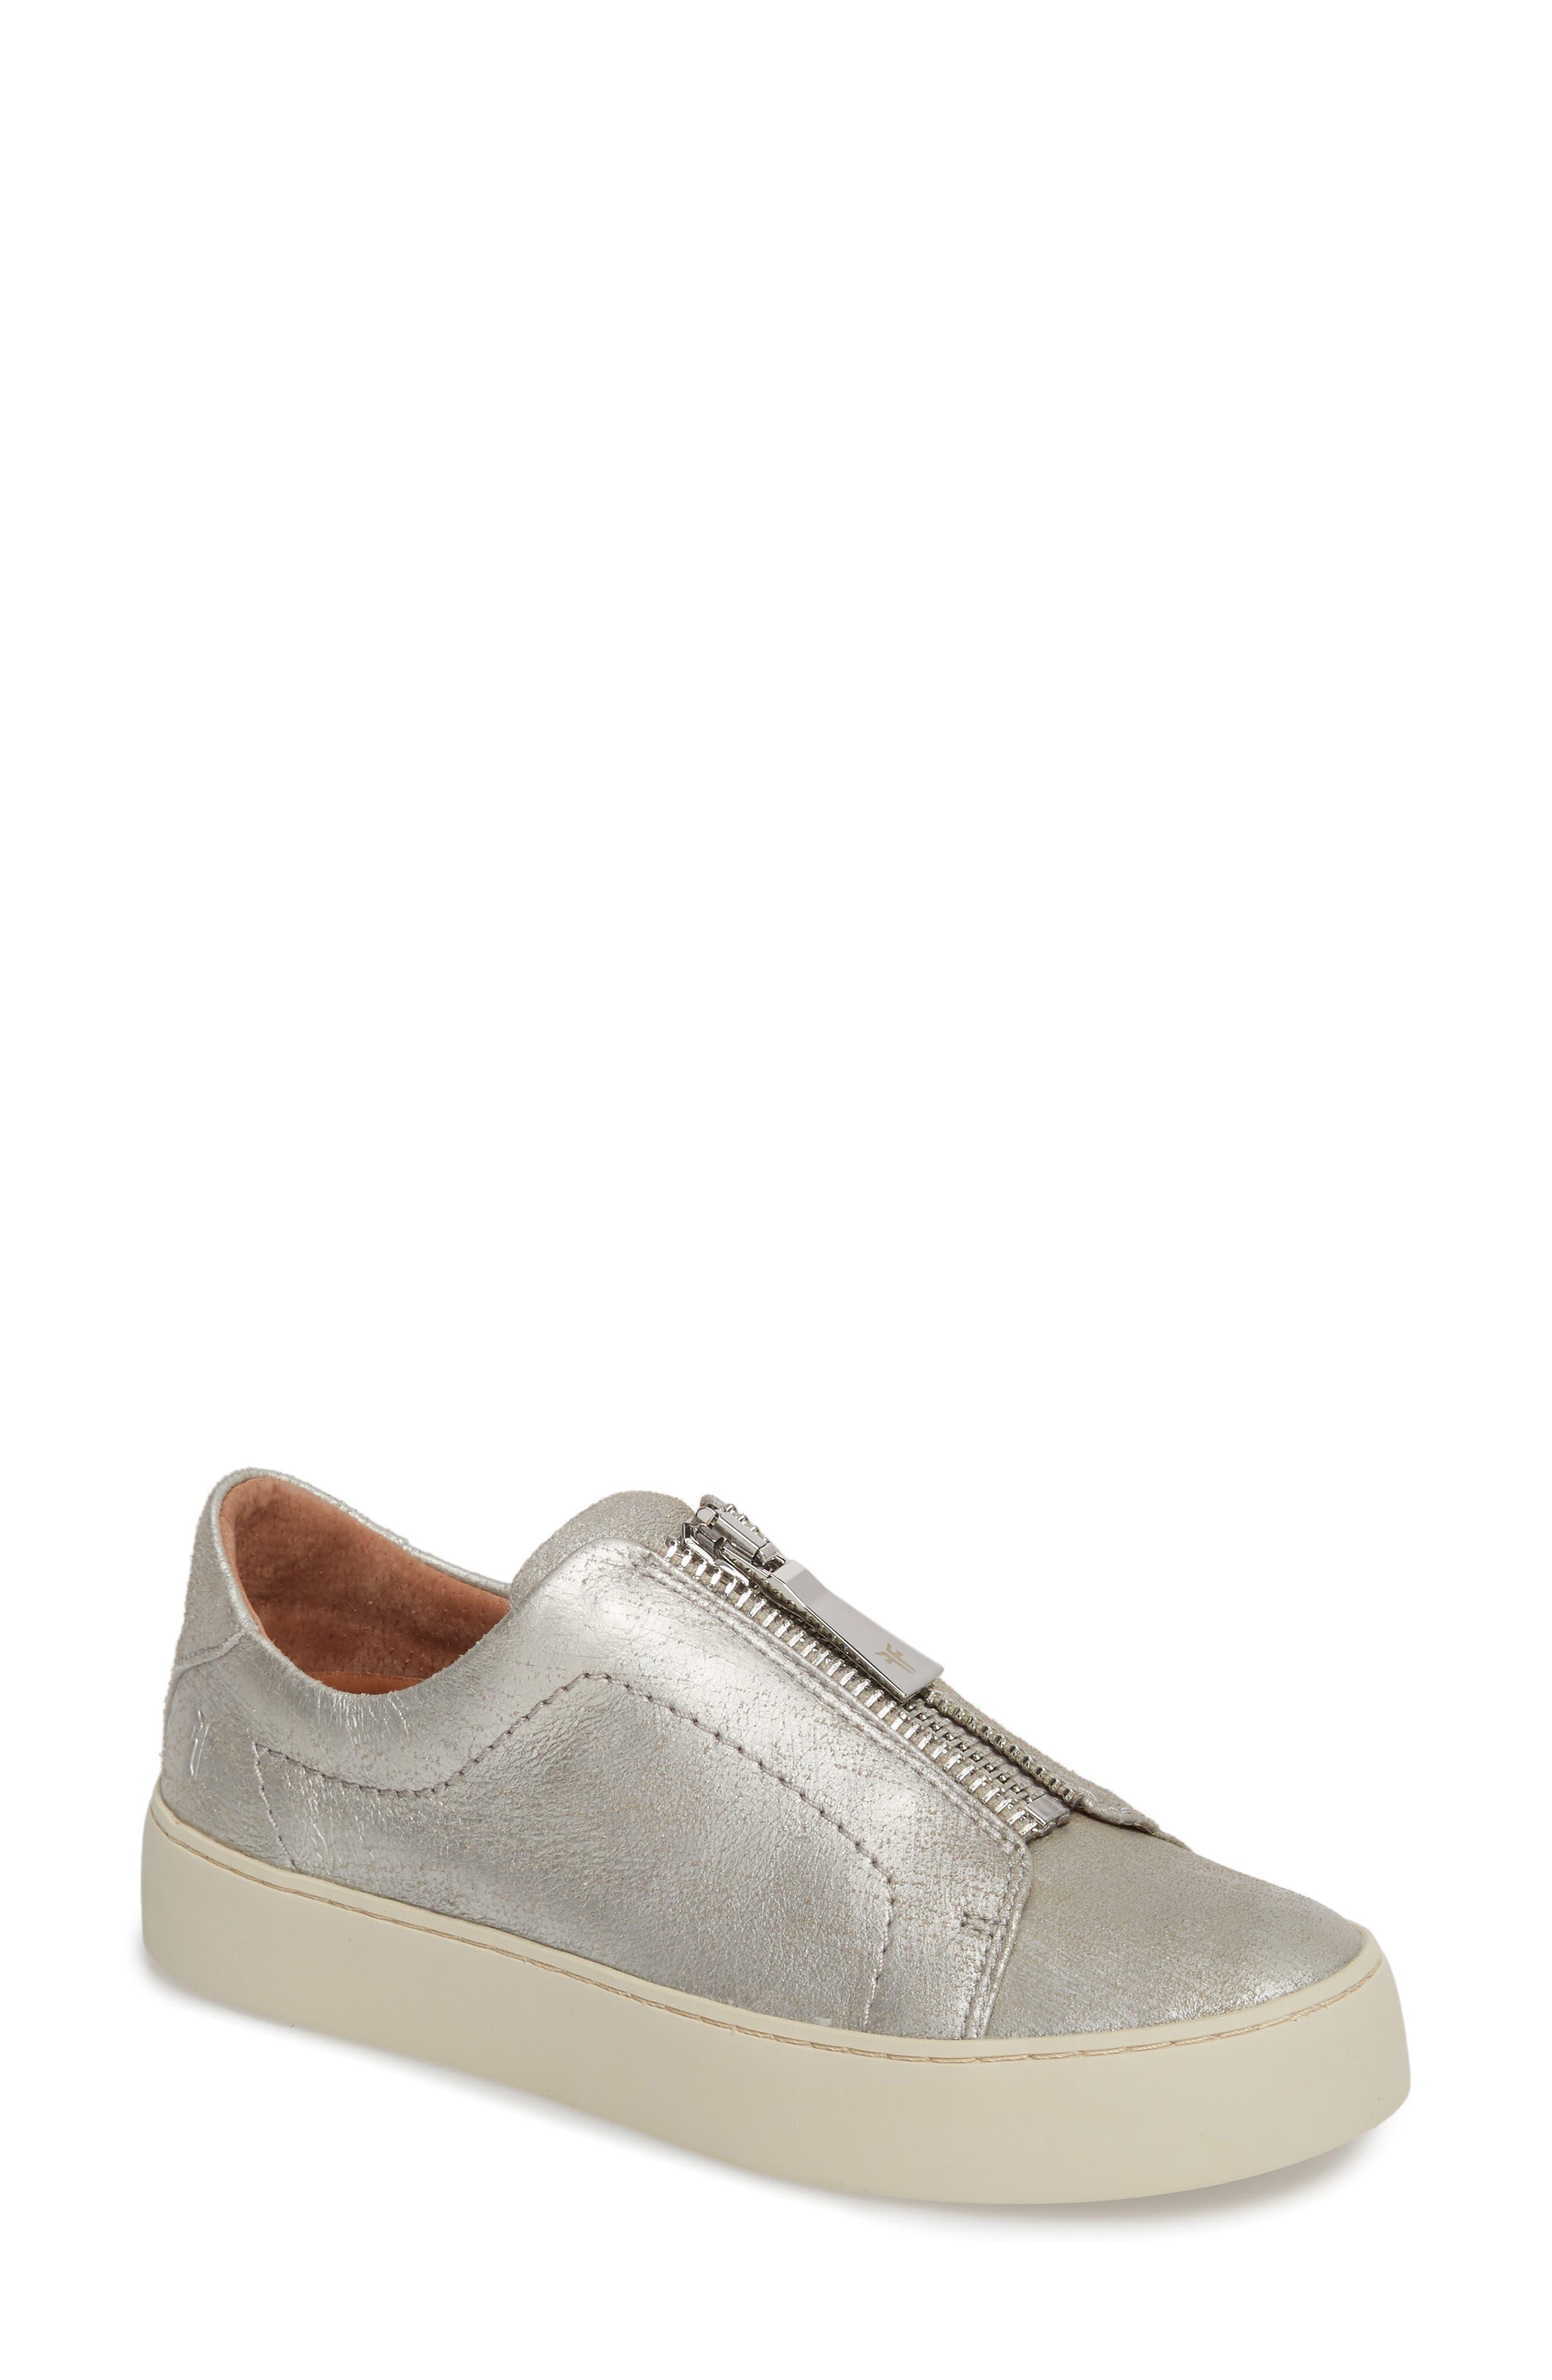 Lena Zip Sneaker,                             Main thumbnail 1, color,                             040